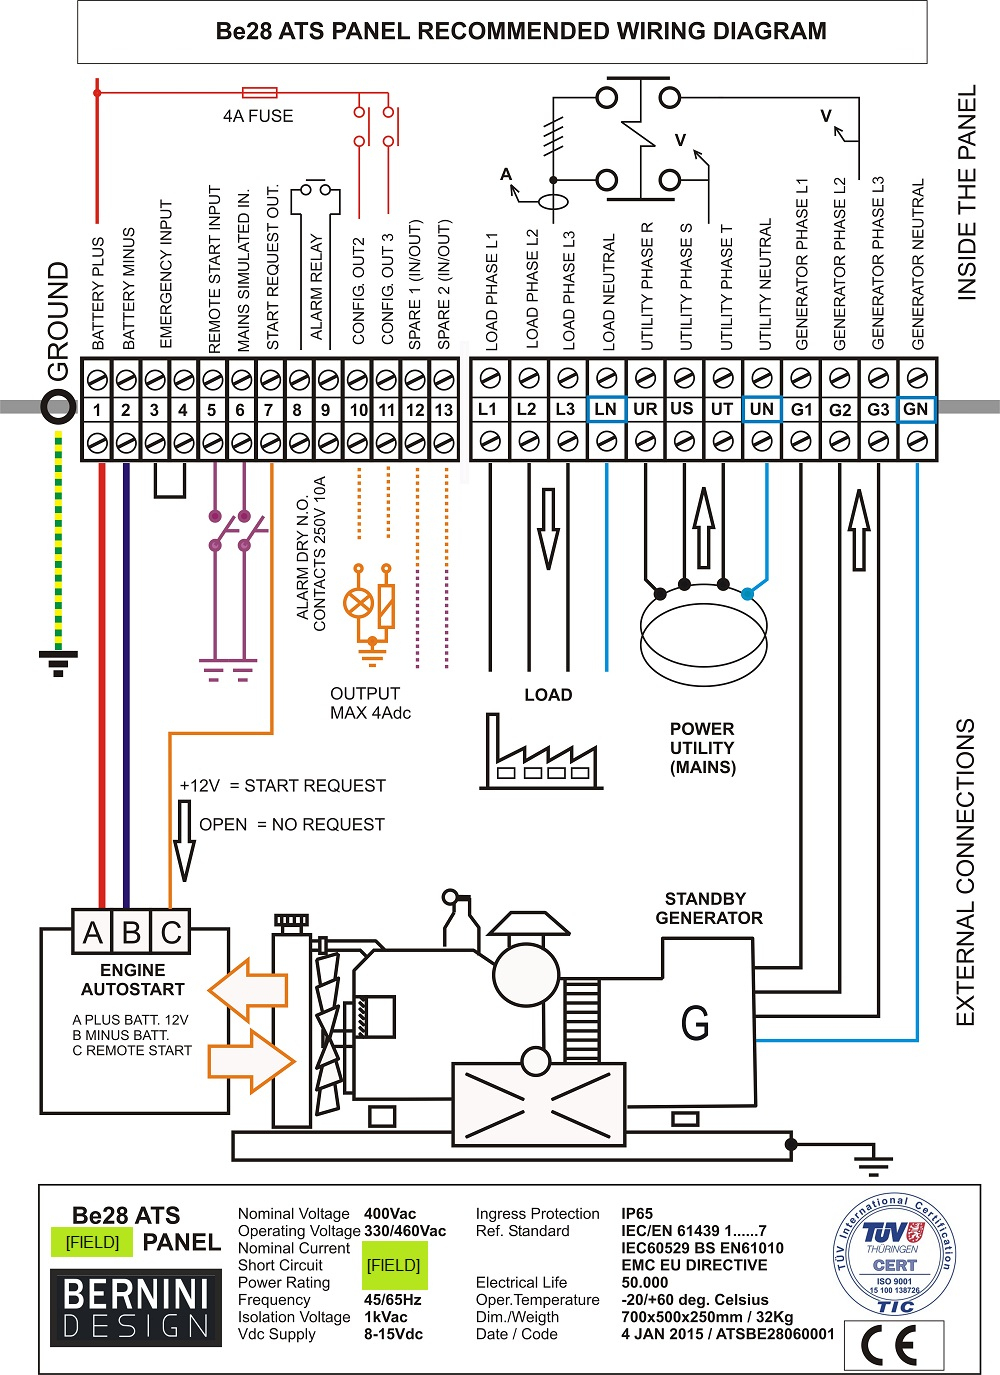 Go Control Panel Wiring Diagram   Wiring Diagram - Generator Backfeed Wiring Diagram